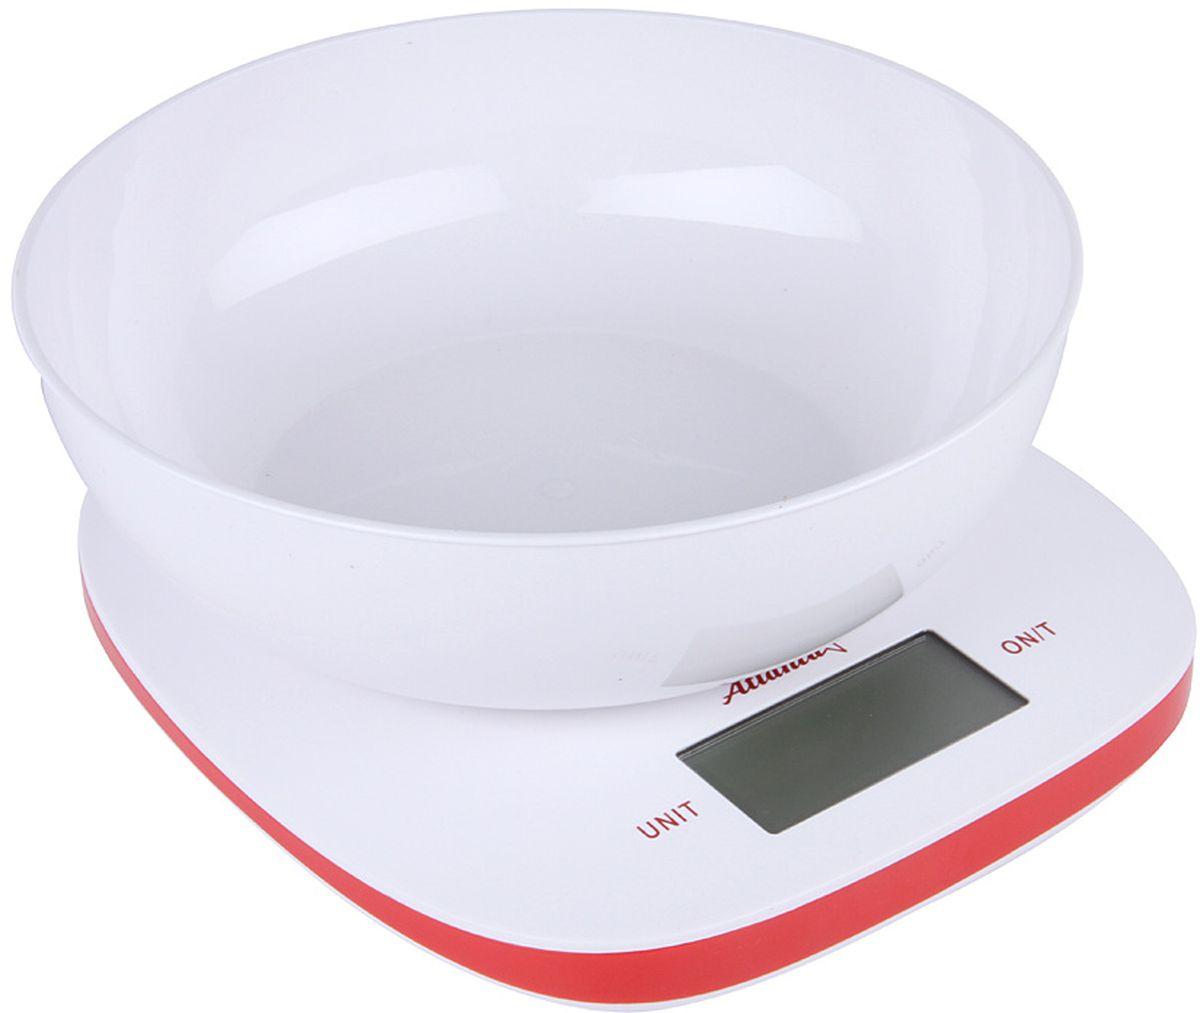 Atlanta ATH-6210, Red весы кухонные